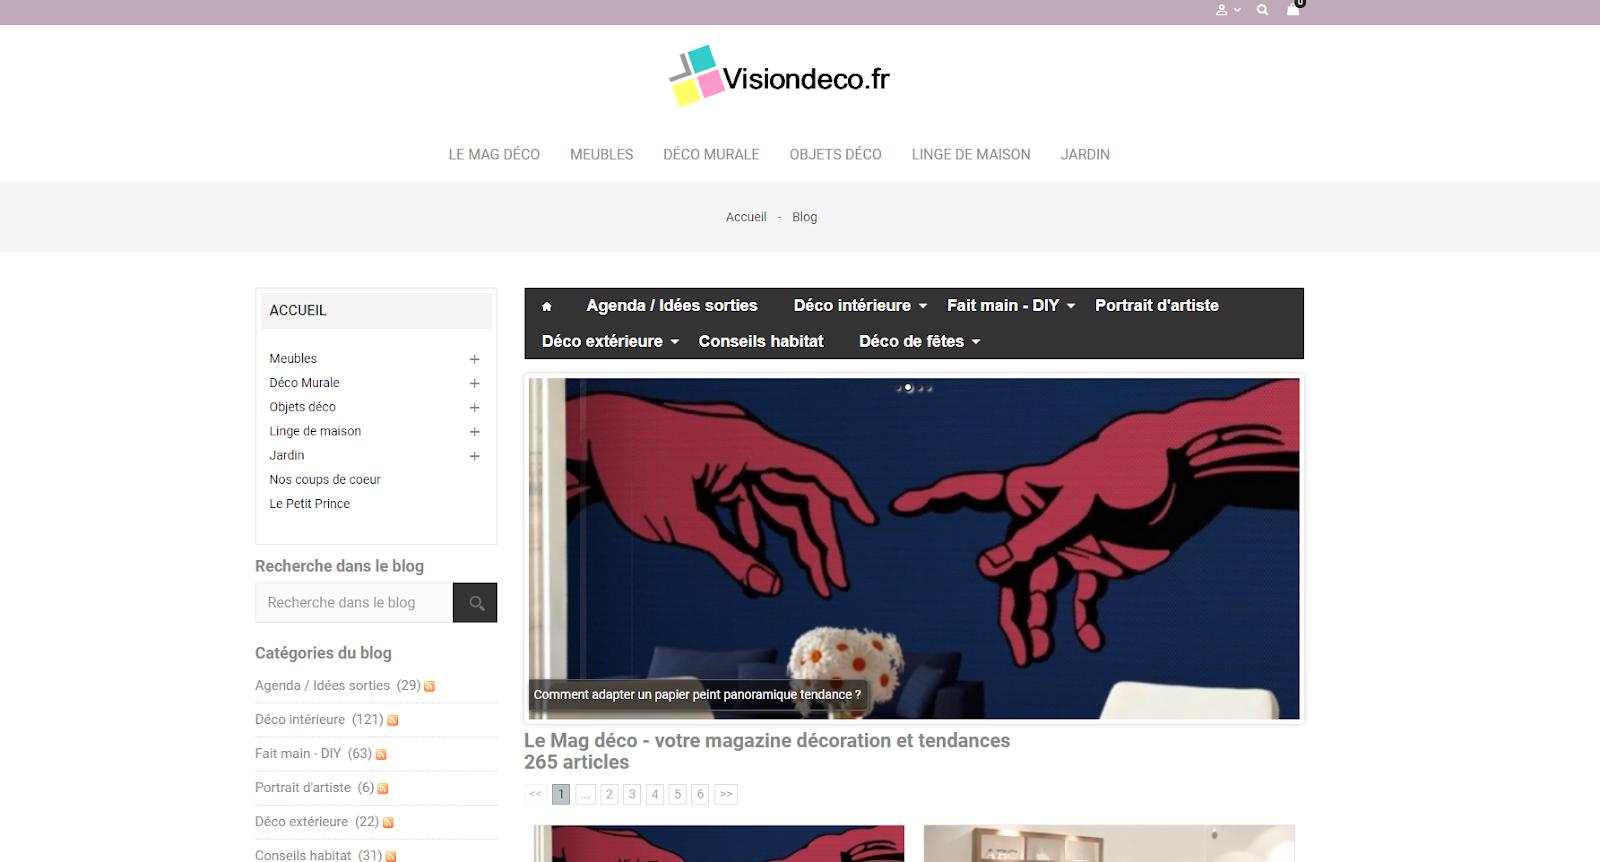 Le blog visiondeco